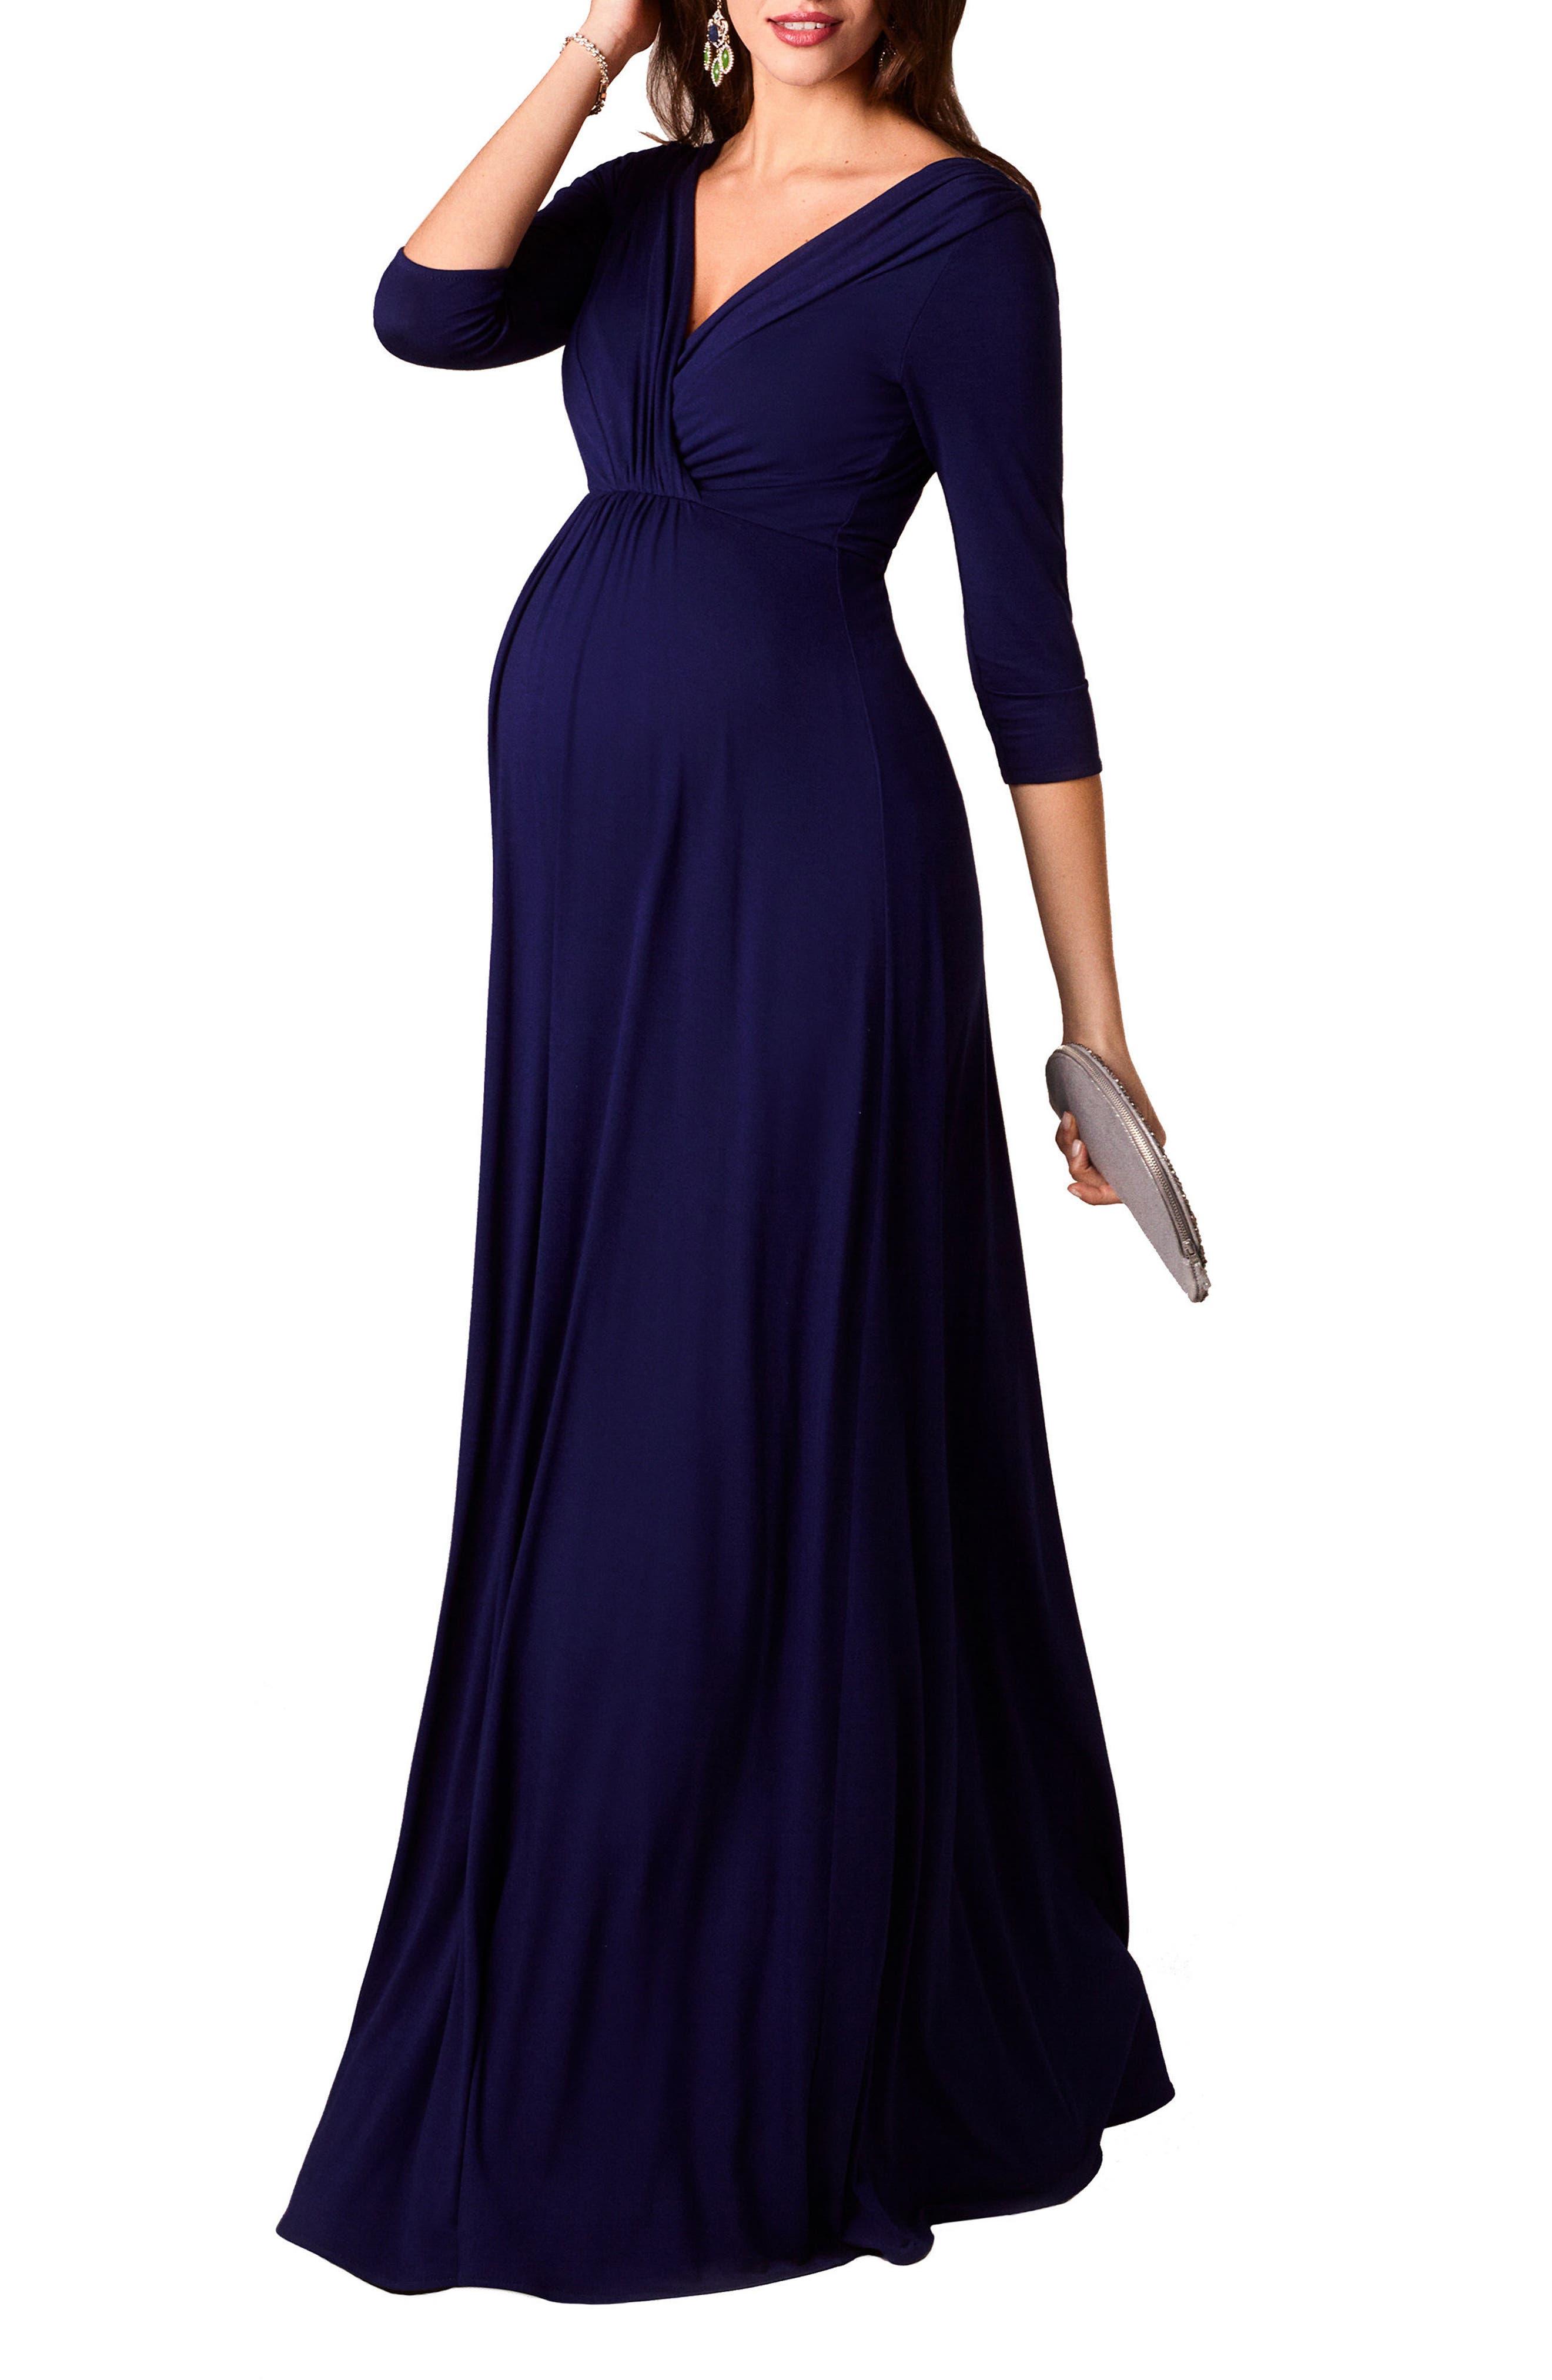 Formal Evening Maternity Dresses